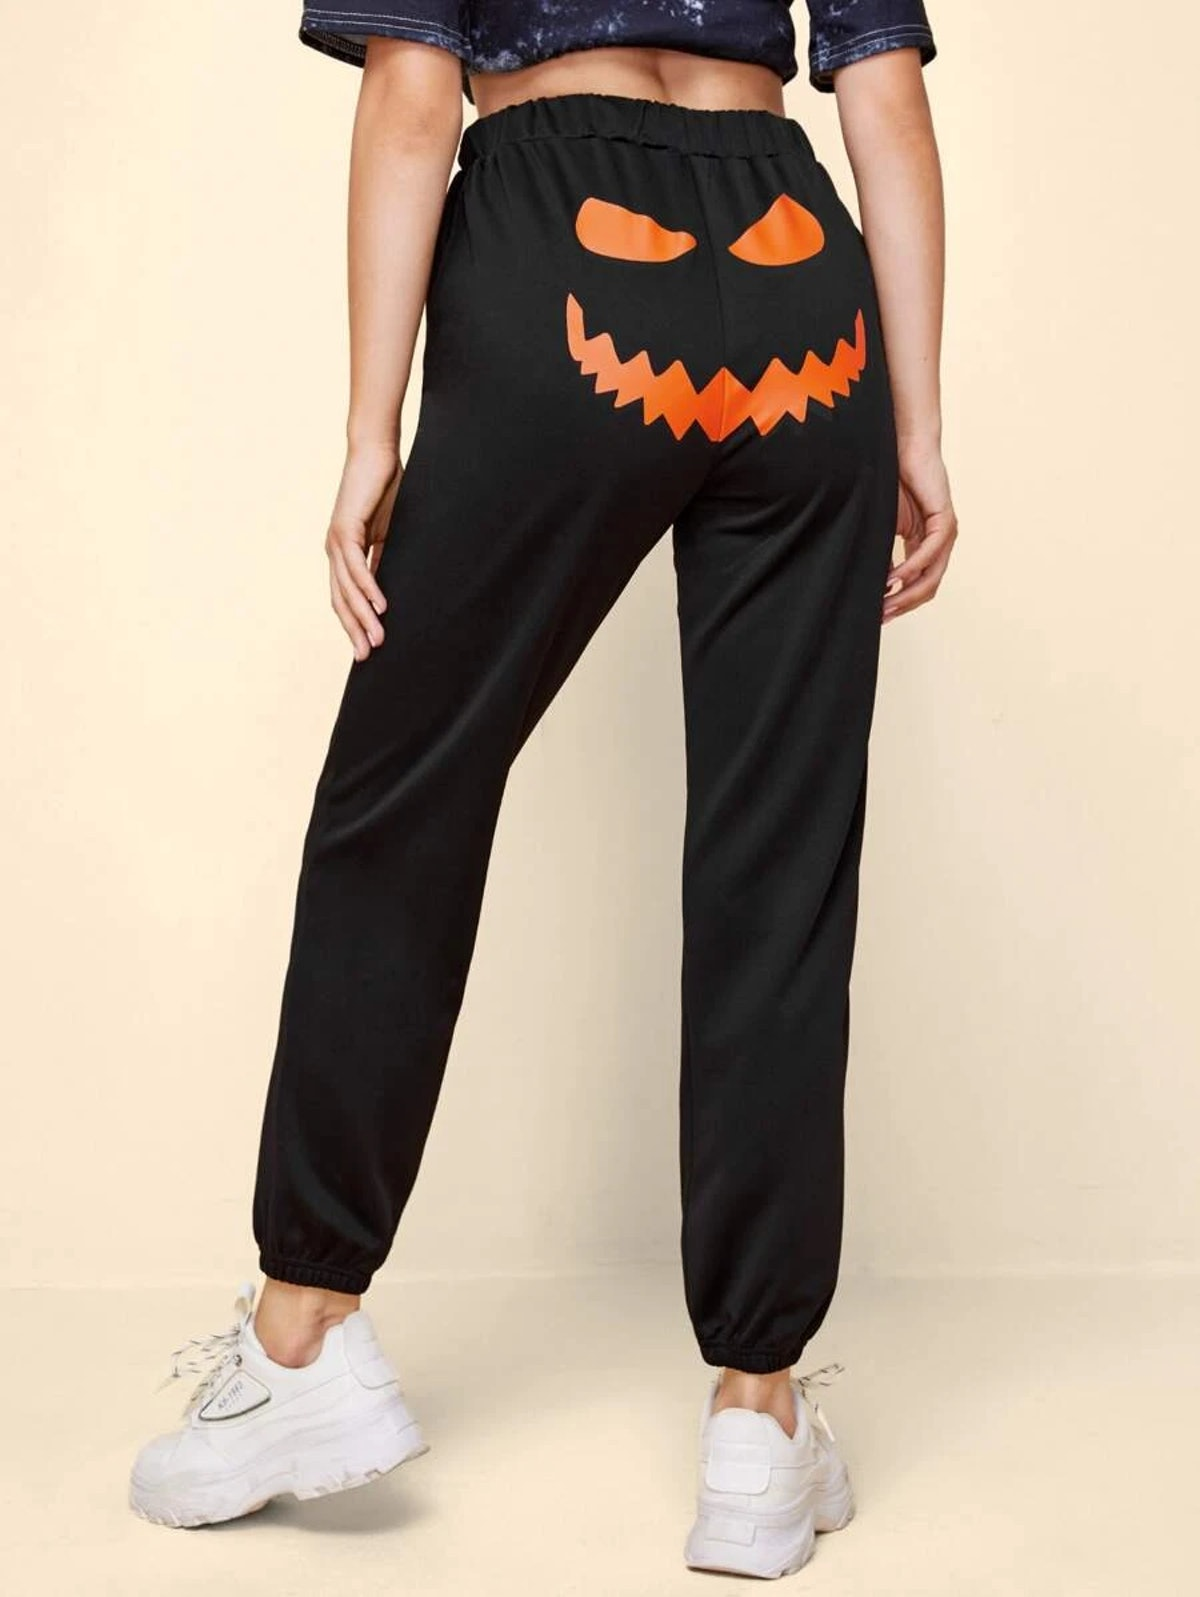 Romwe Halloween Graphic Sweatpants